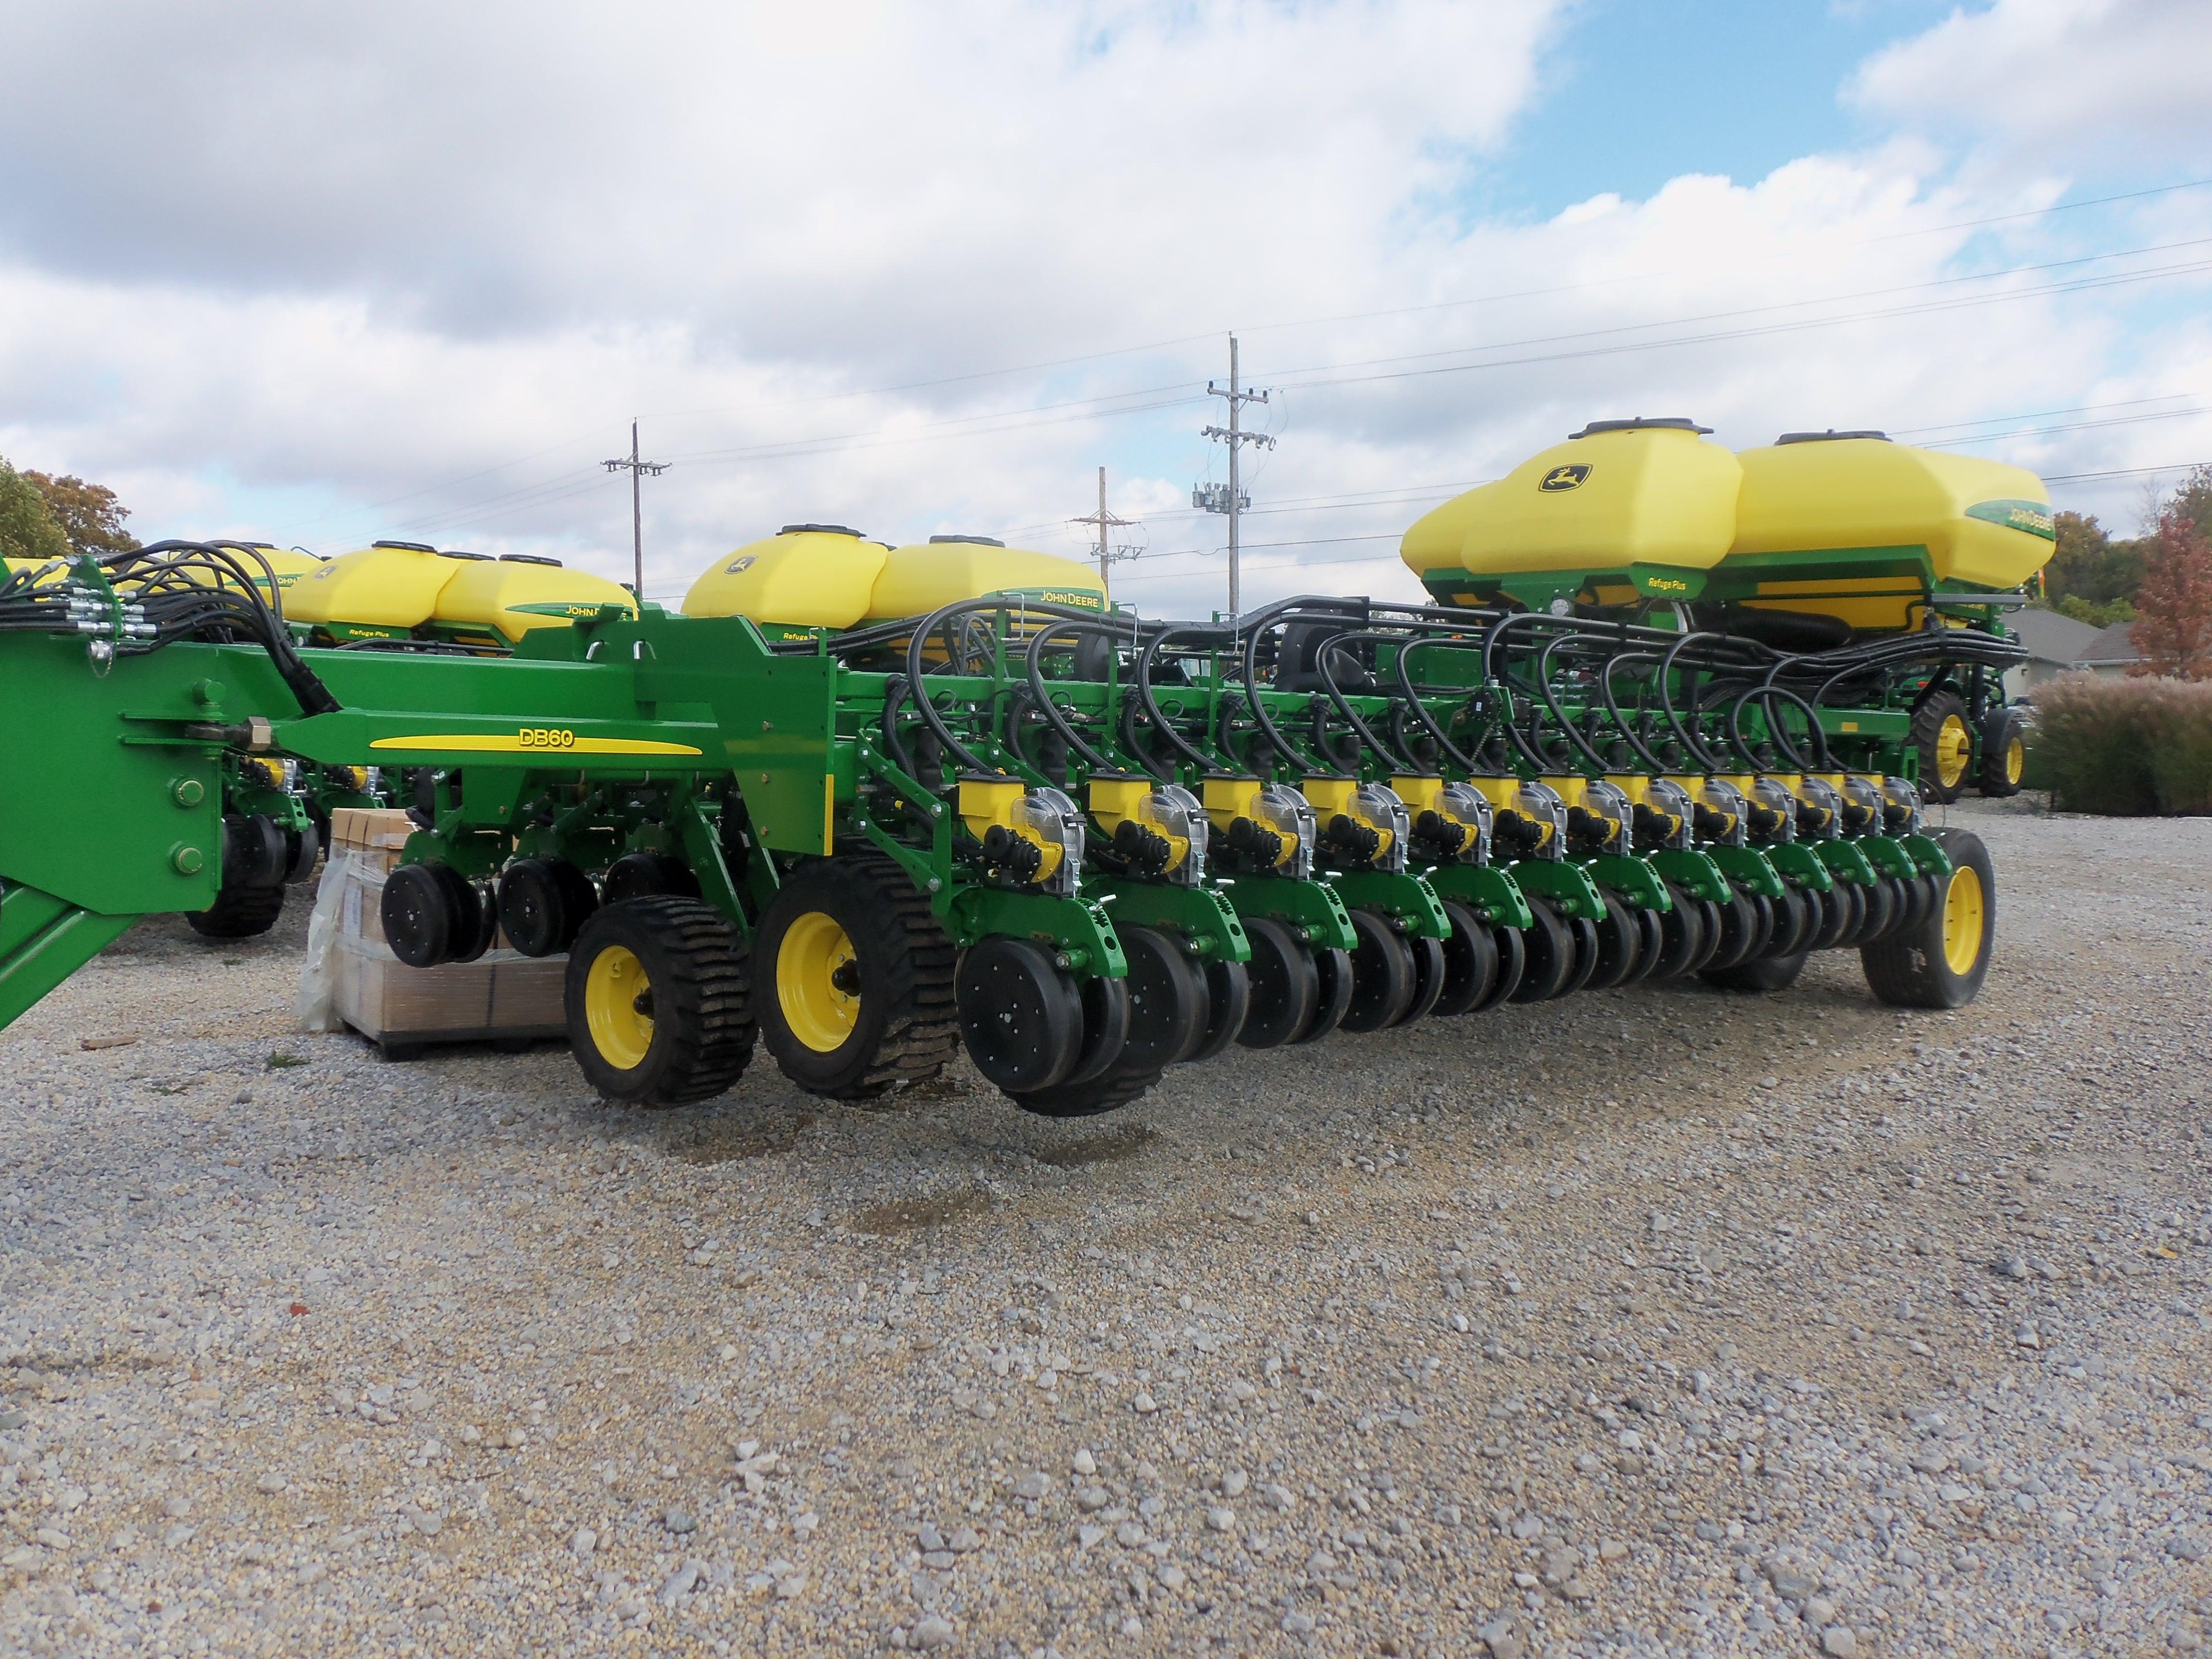 30 row John Deere DB60 corn planter | John Deere equipment | Pintere ...